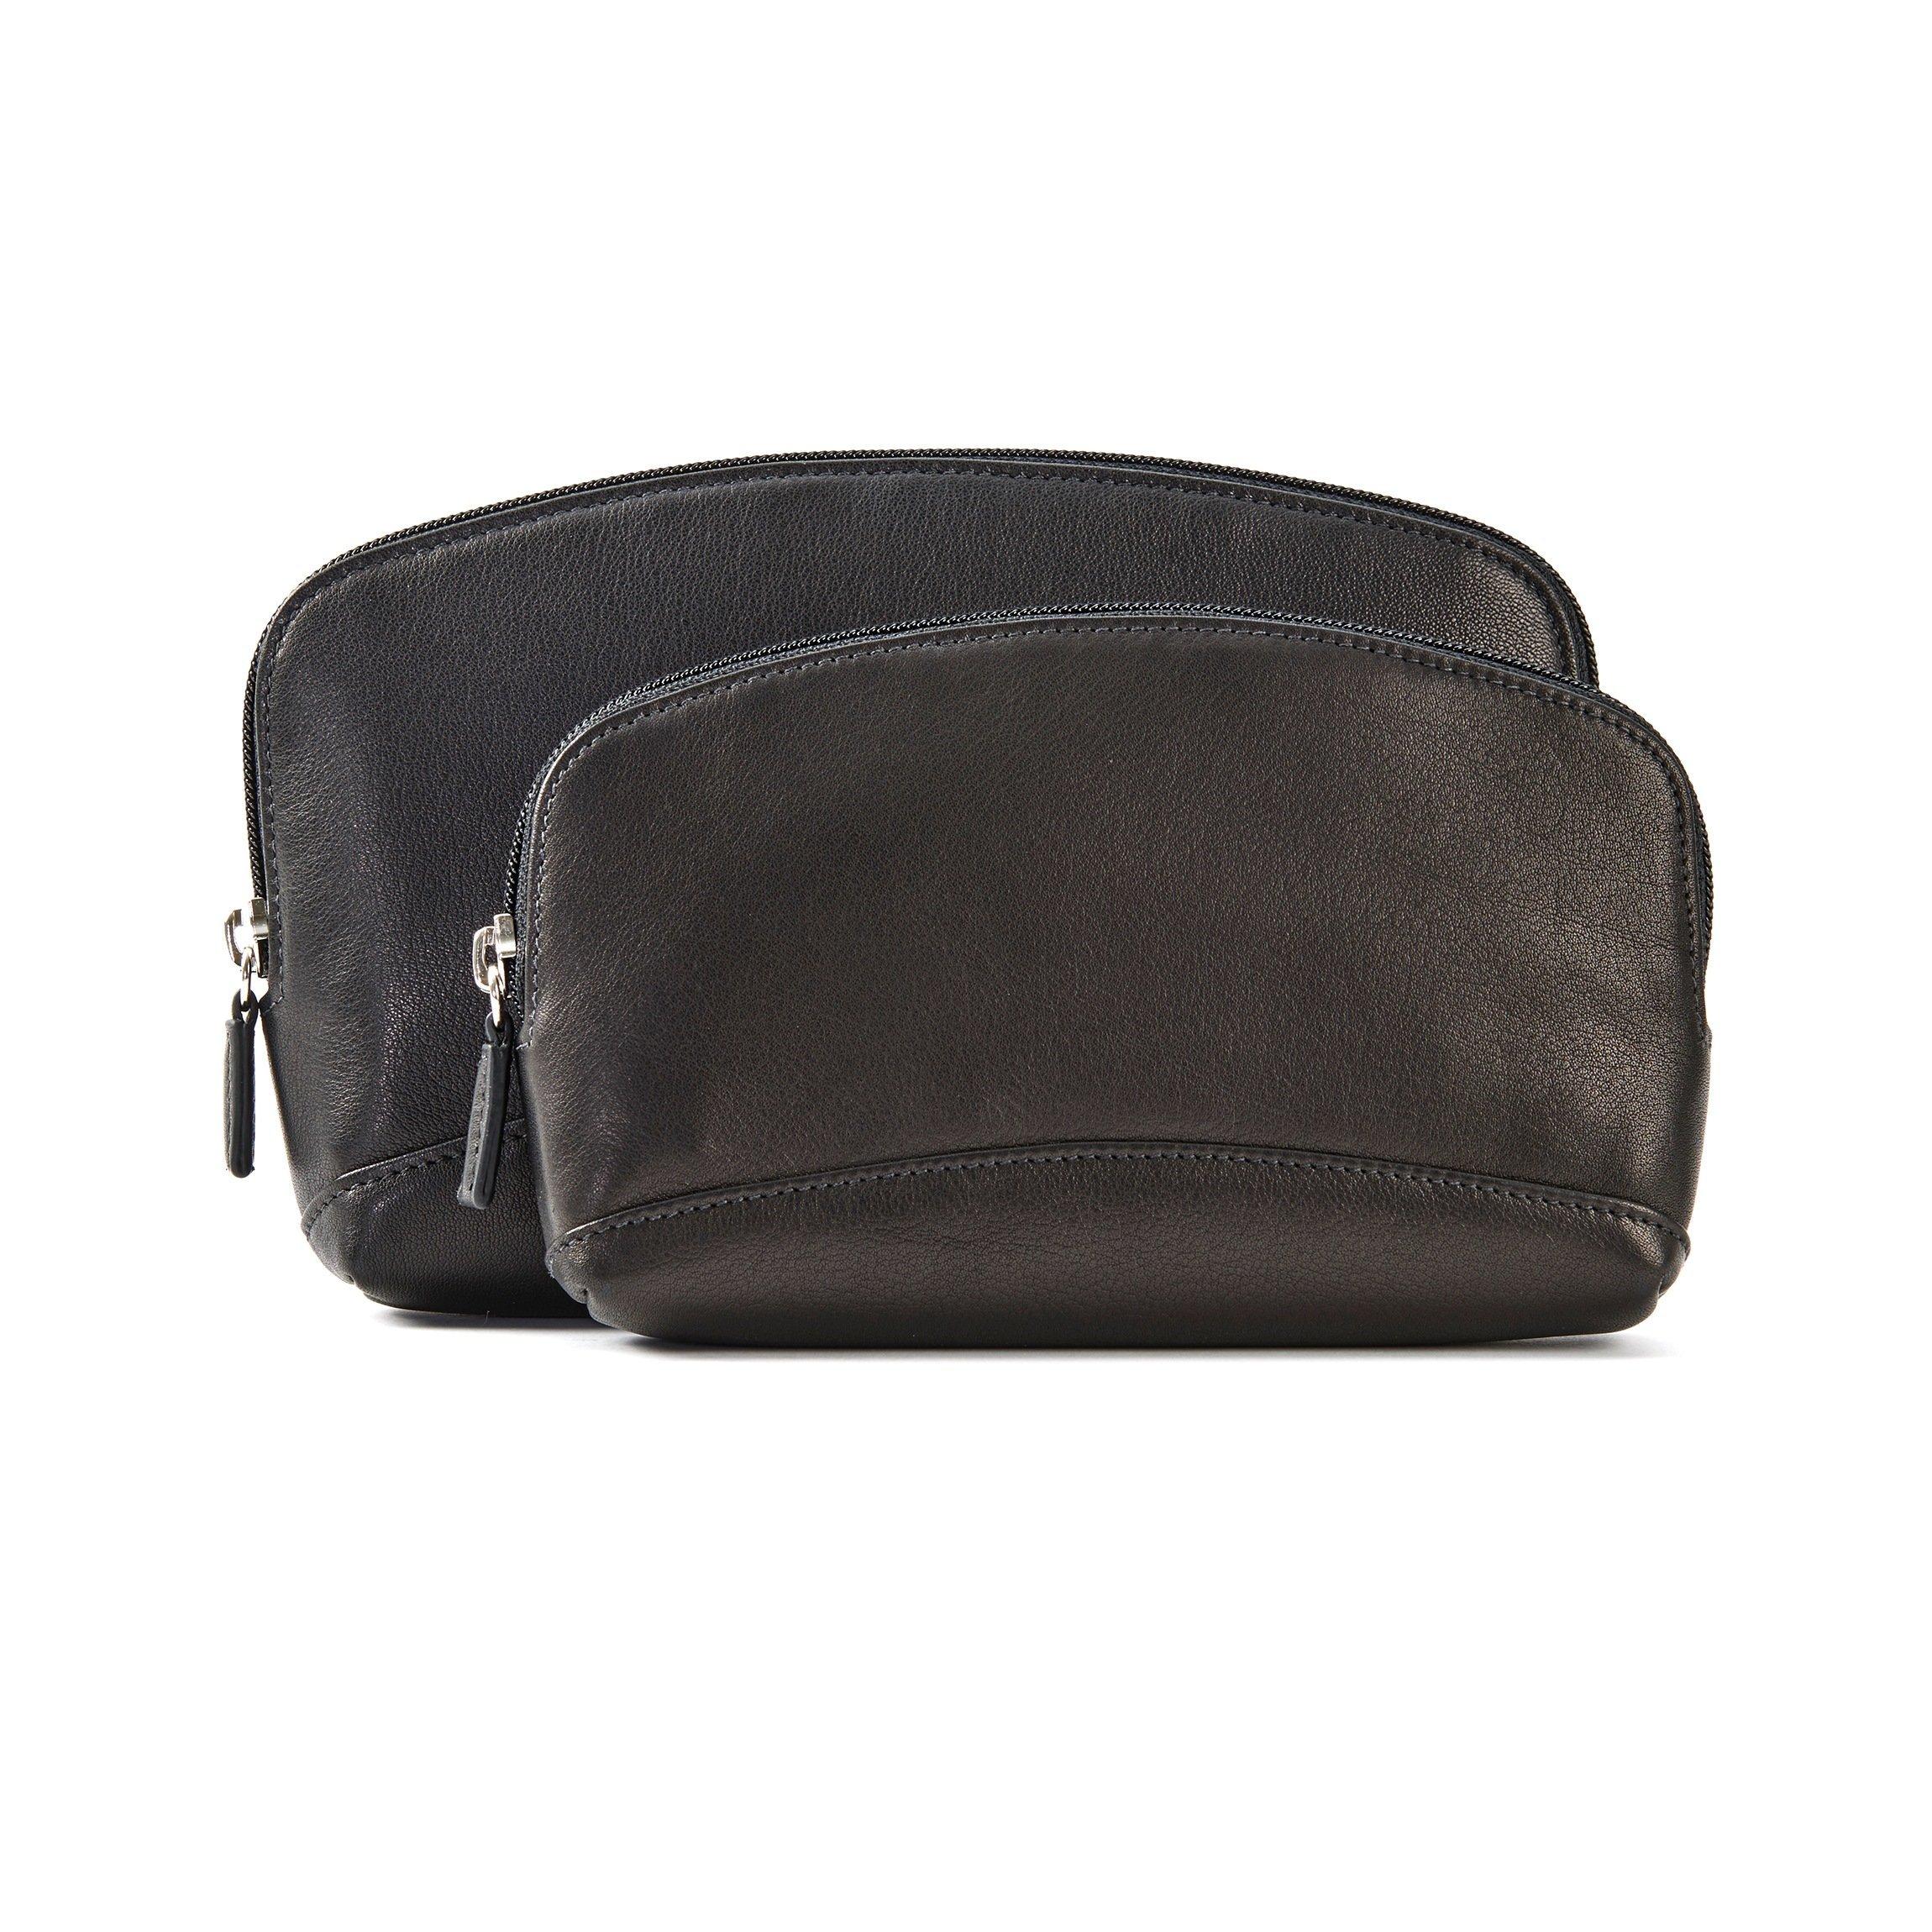 Cosmetic Bag Set - Full Grain Leather - Black Onyx (black)